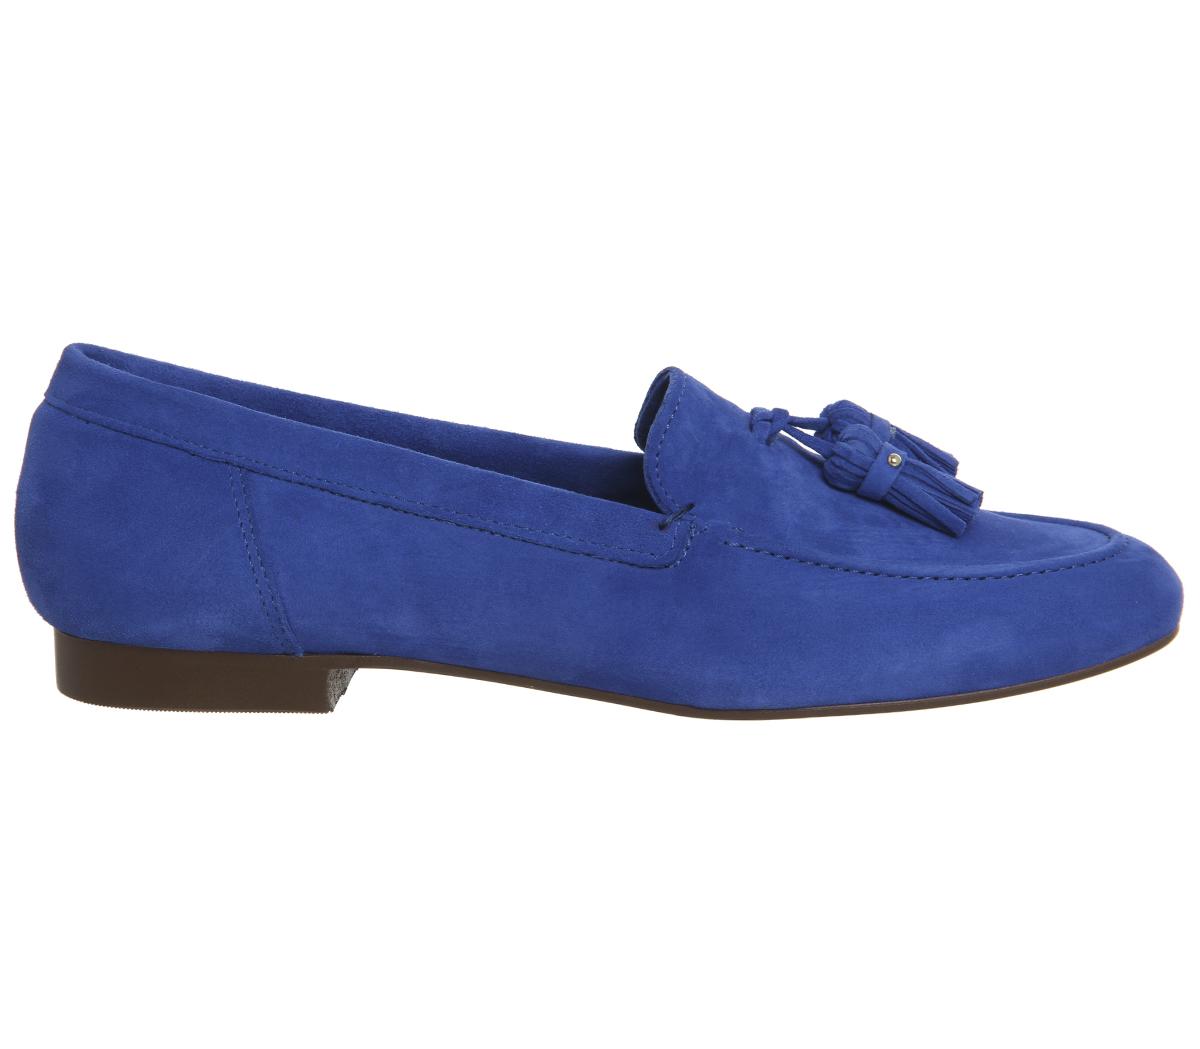 Damenschuhe Office Retro Blau Tassel Loafers BRIGHT Blau Retro SUEDE Flats 307261